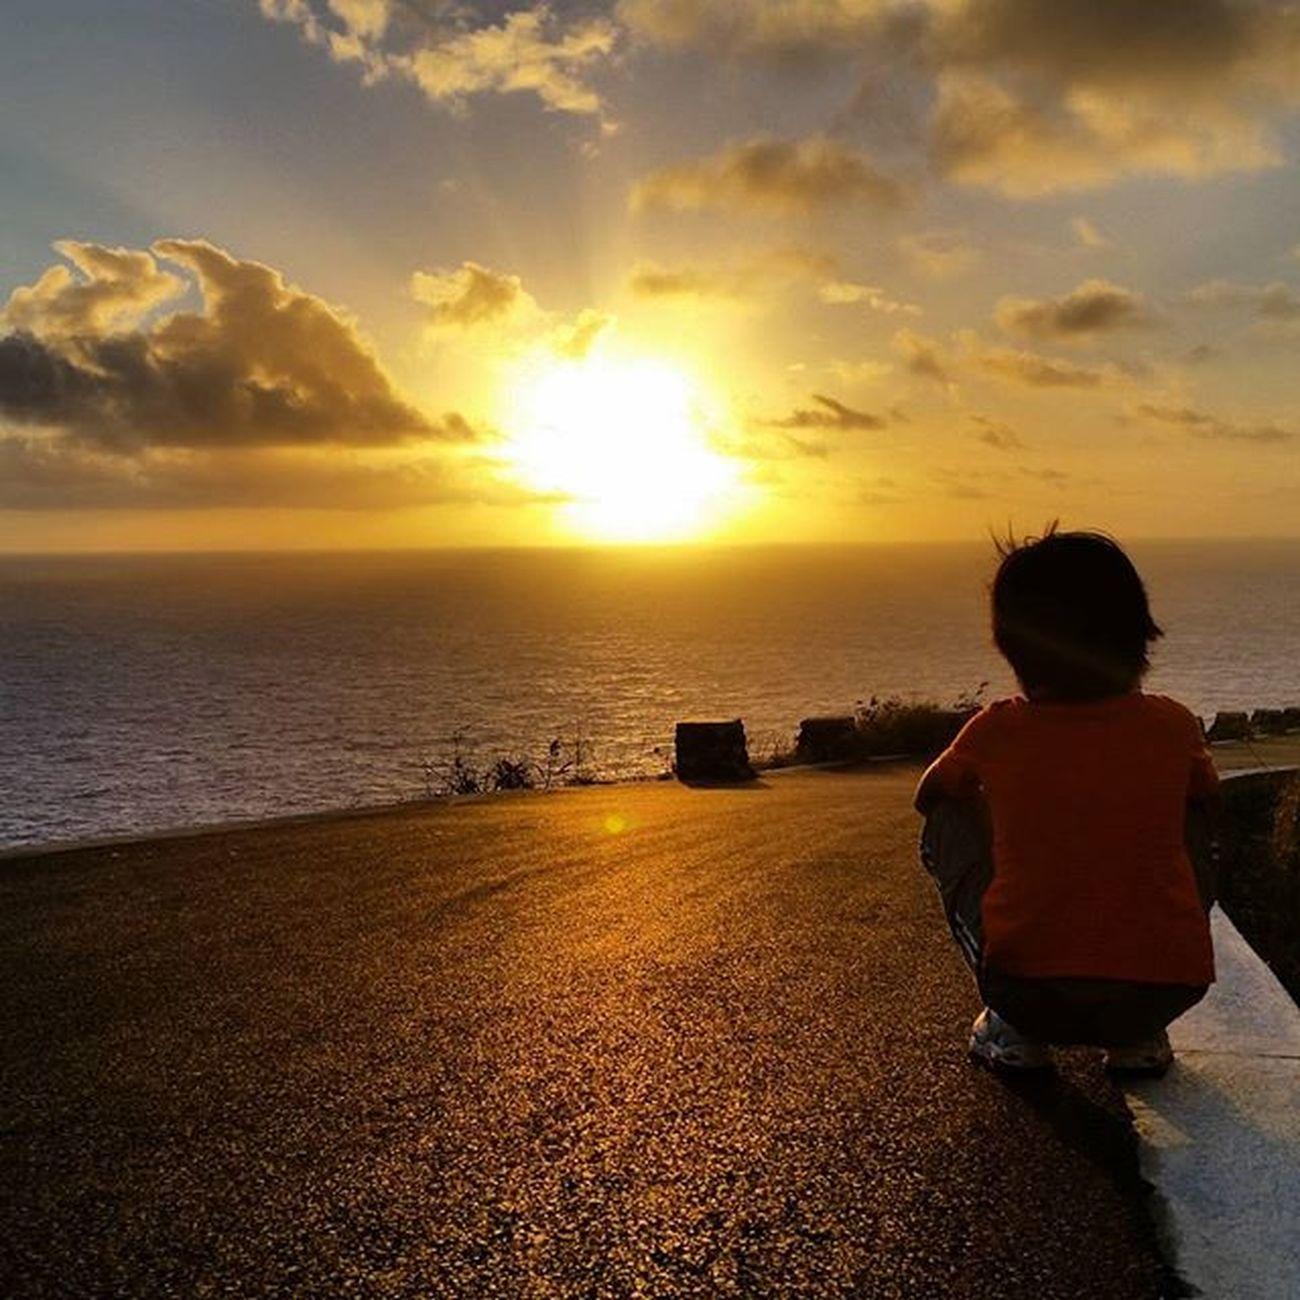 Aloha Kakahiaka! What a beautiful morning! Sun Sunrise Yellow Silhouette Makapuulighthouse Honolulu  Hawaii Sky Pretty Beautiful Oahu Orange Instagramhawaii Skyporn Cloudporn Nature Clouds Horizon Photooftheday Instagood Gorgeous Warm View Morning Instamoment instagramers instasky mornings instadaily instamood